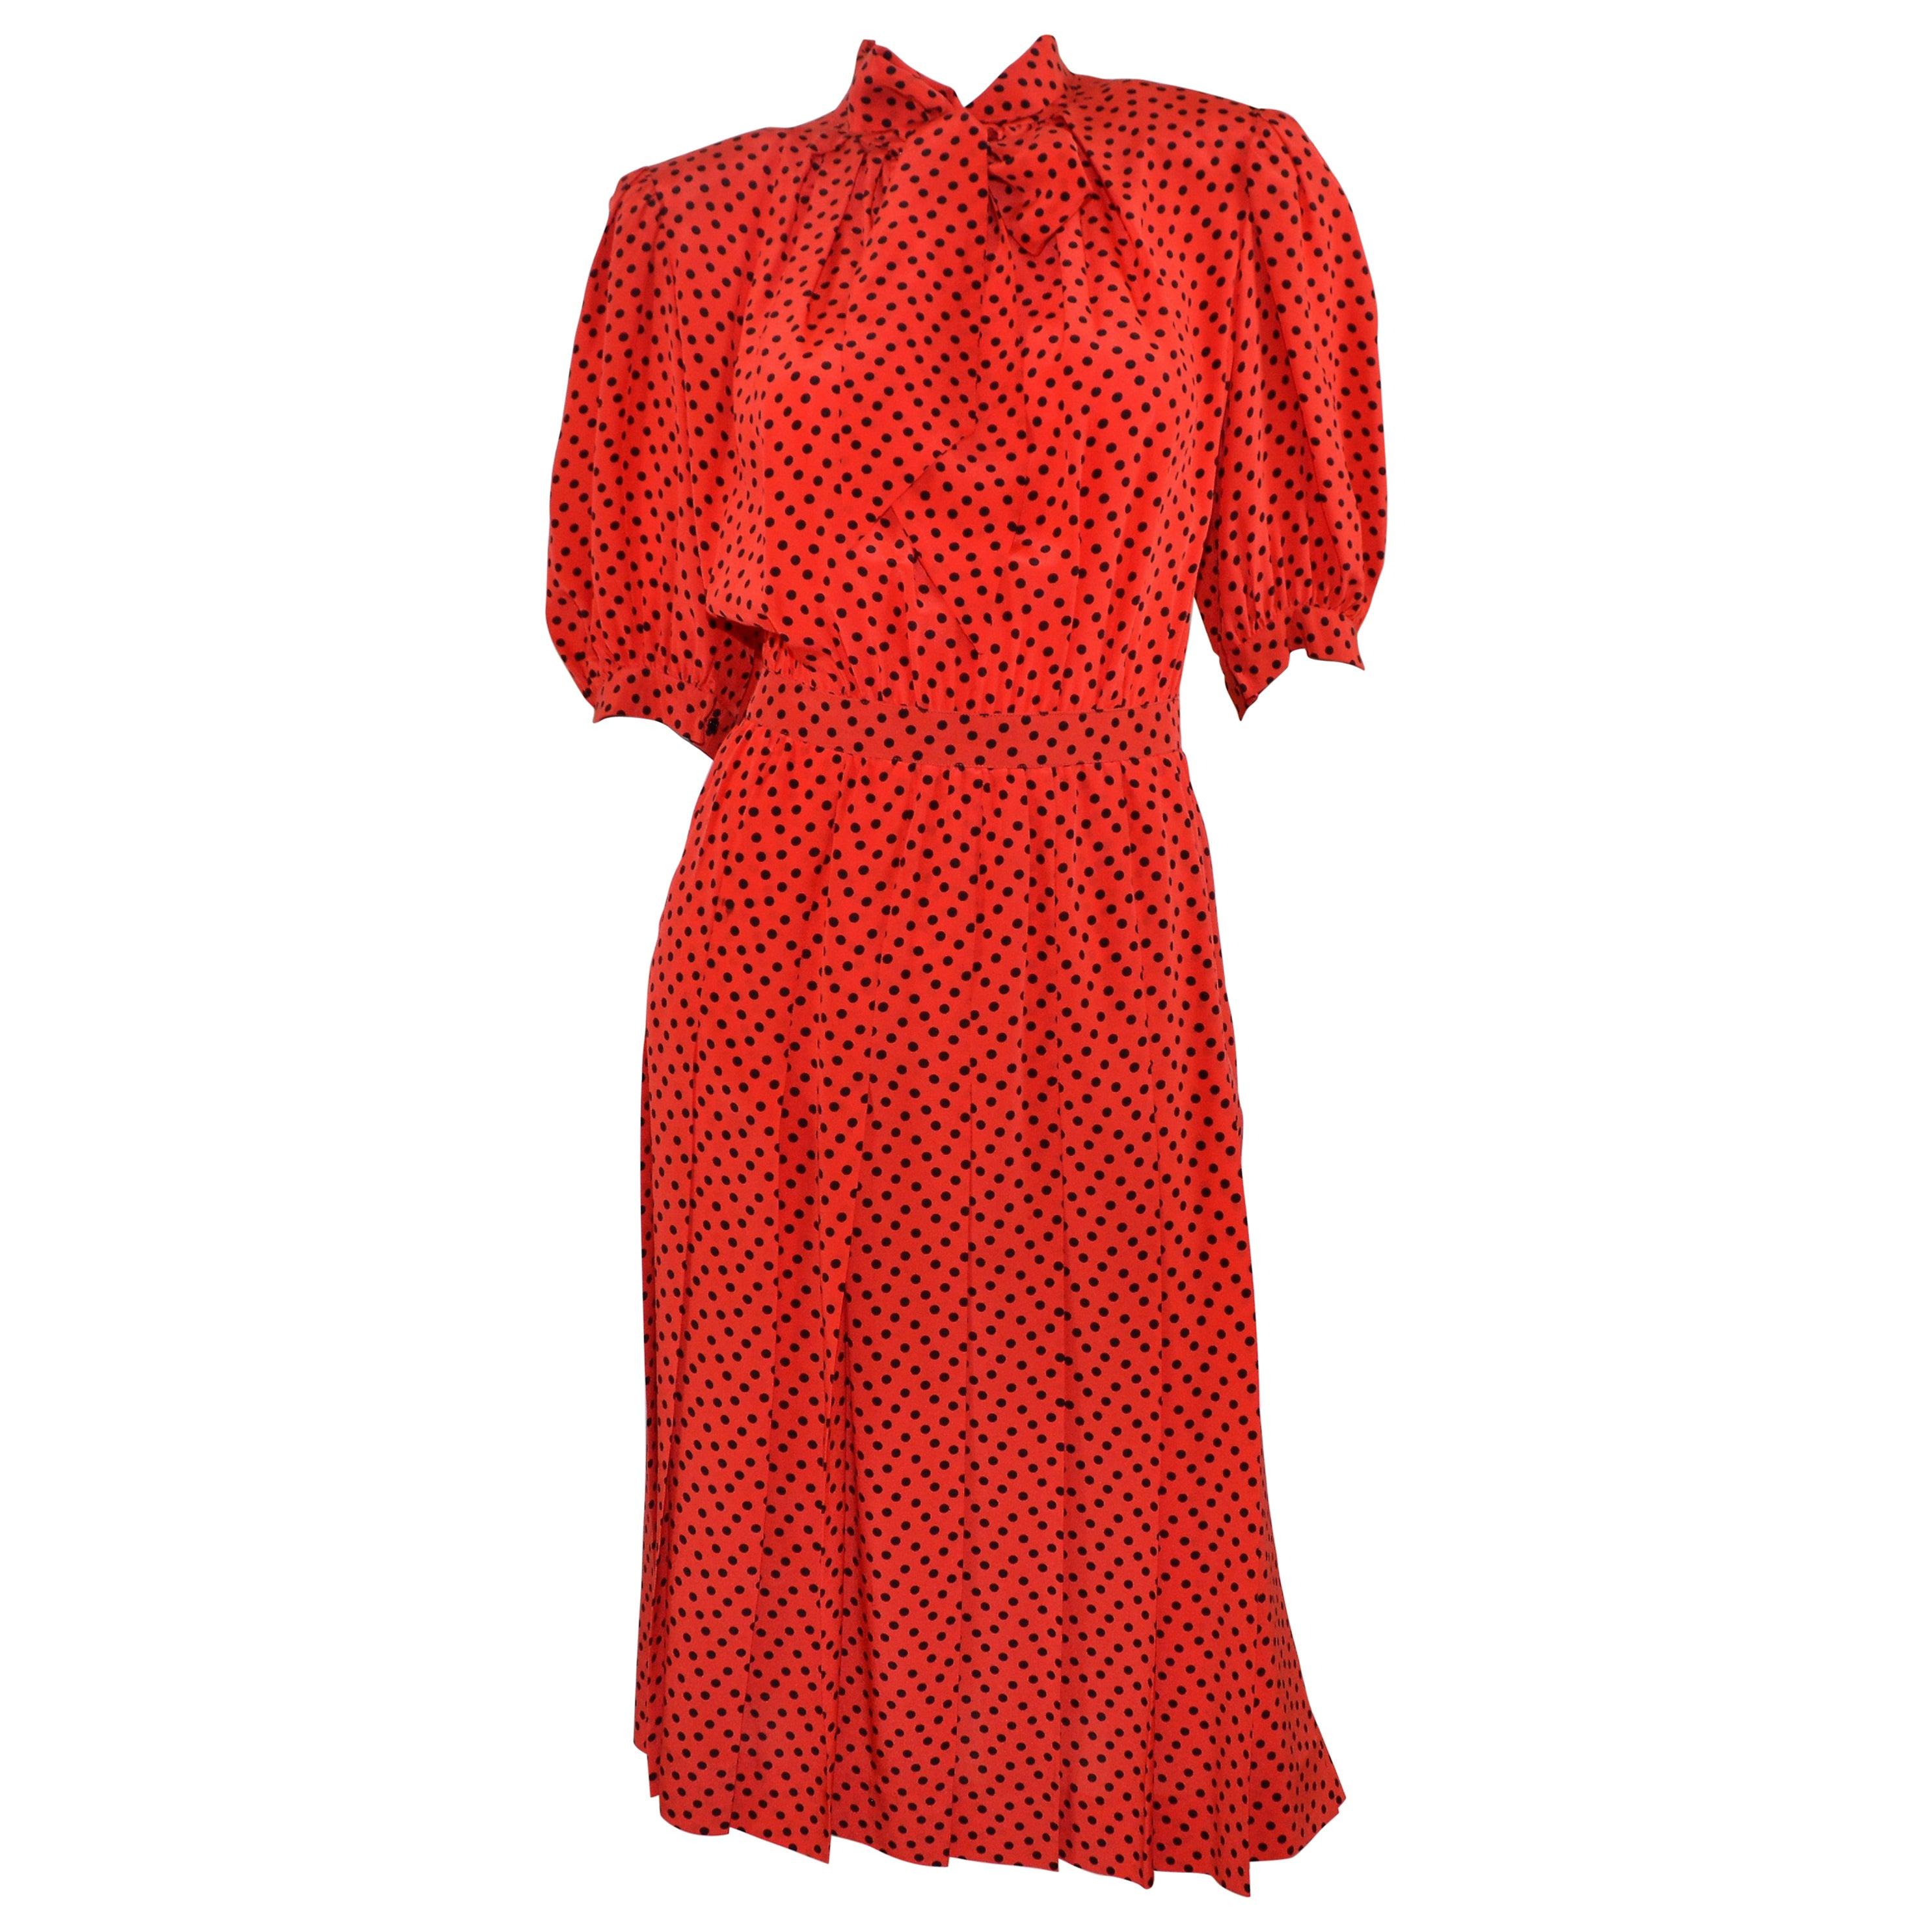 Vintage Saint Laurent Rive Gauche Polka-Dot Pleated Dress with Neck Tie